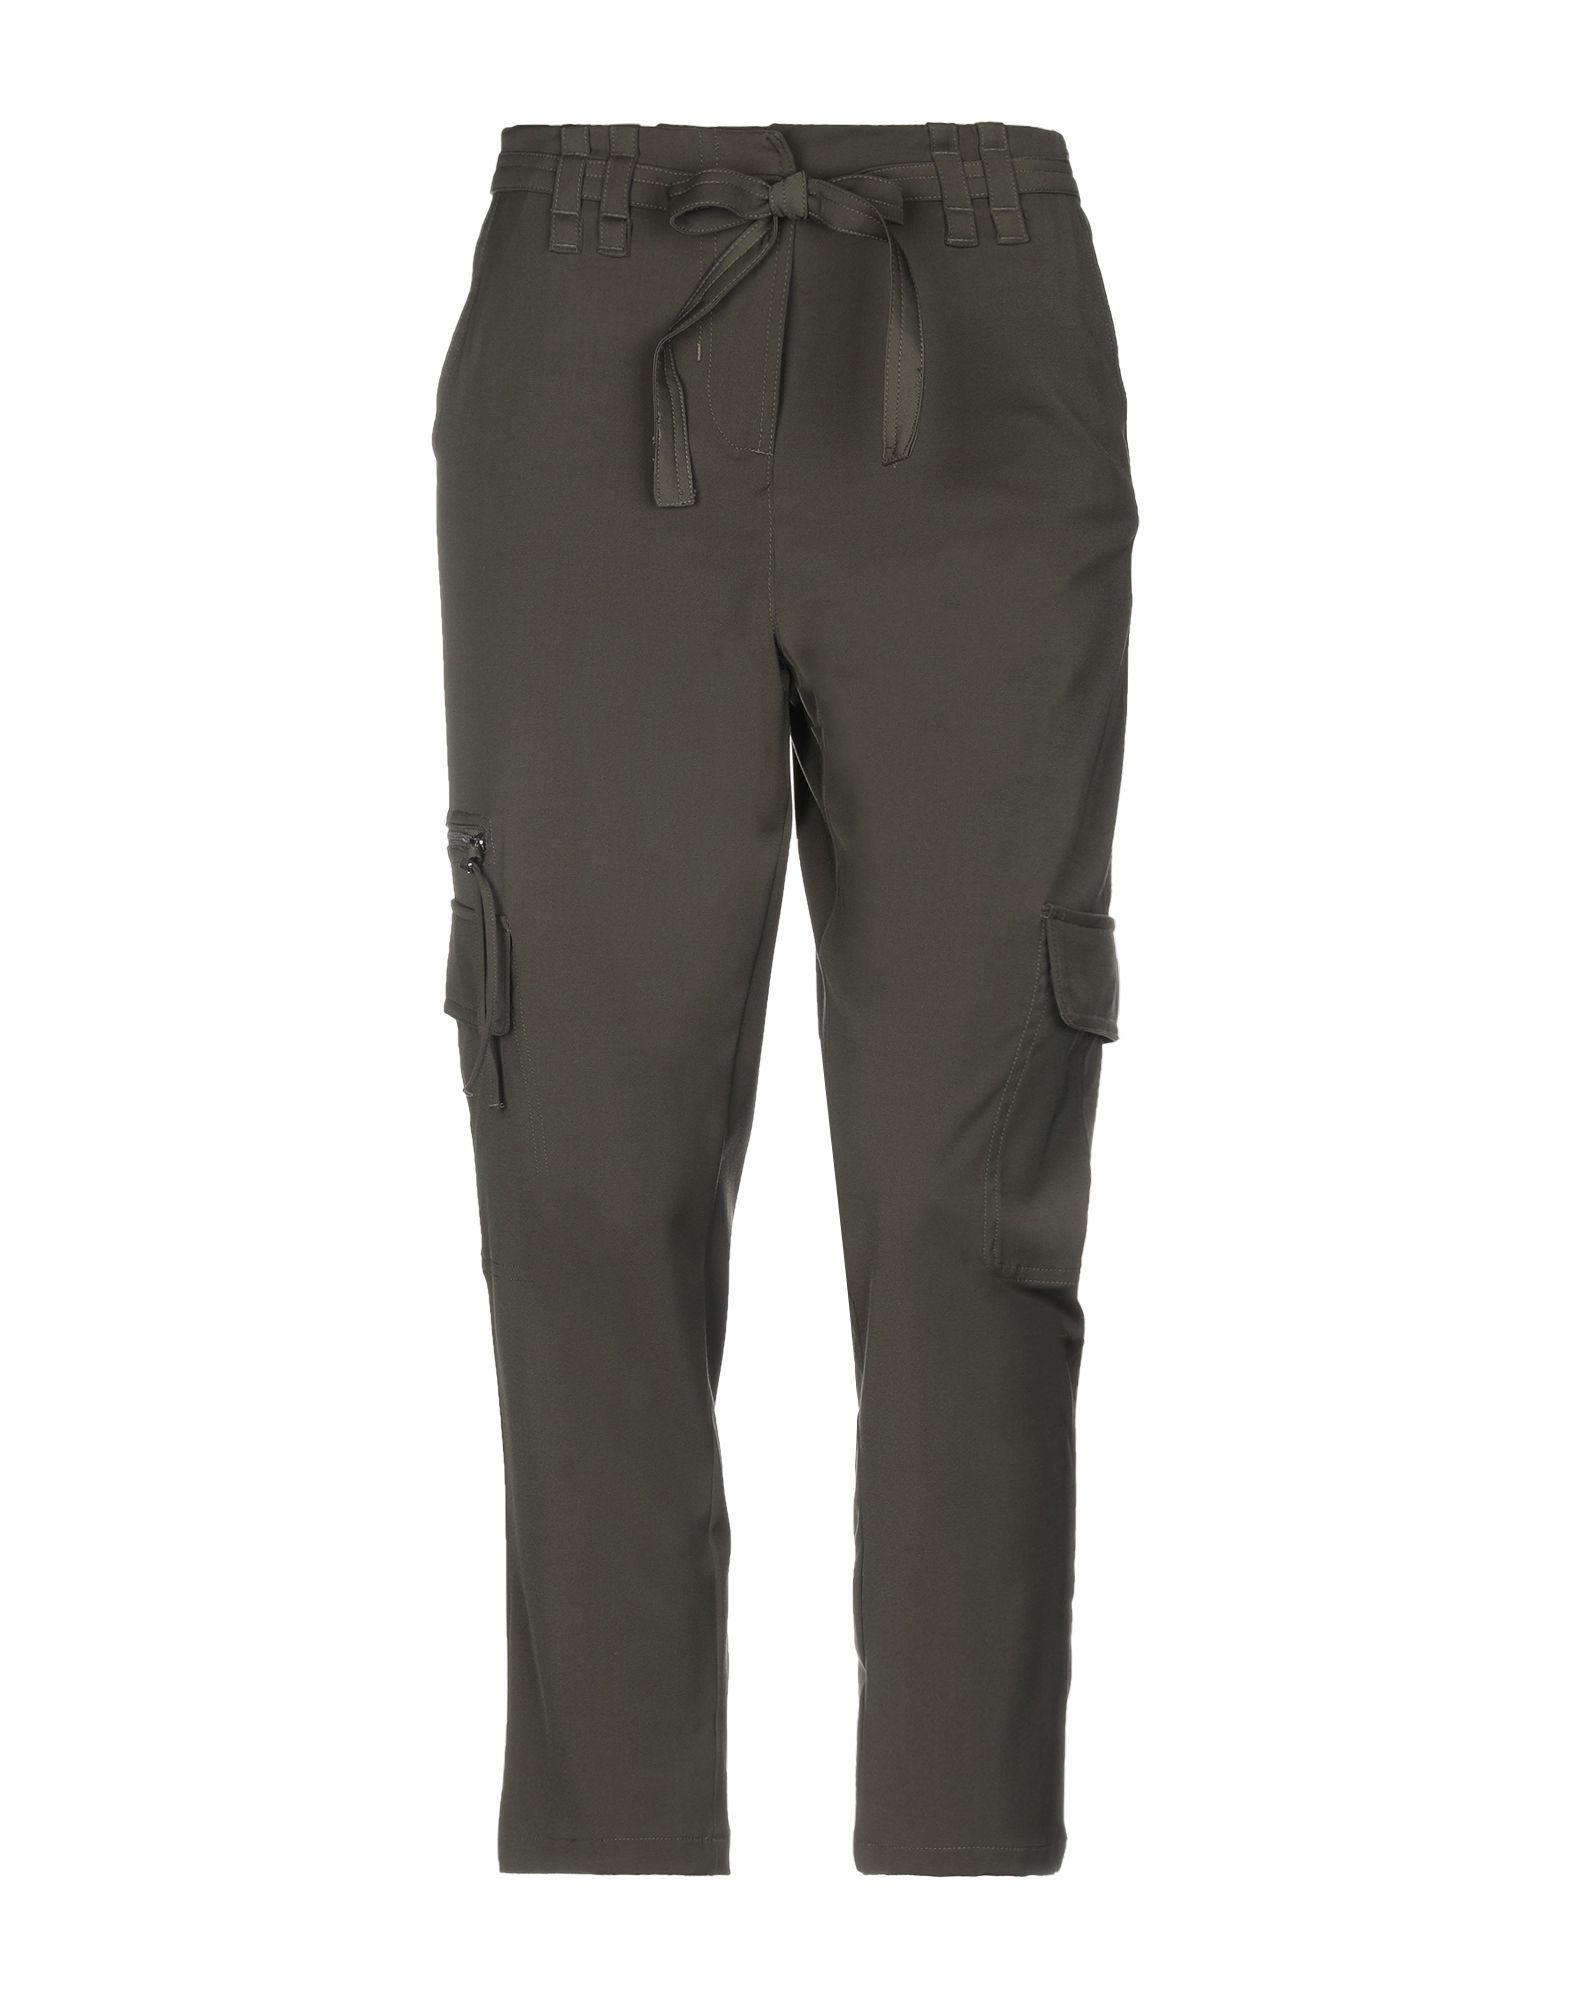 Фото - MARELLA SPORT Повседневные брюки marella sport брюки капри